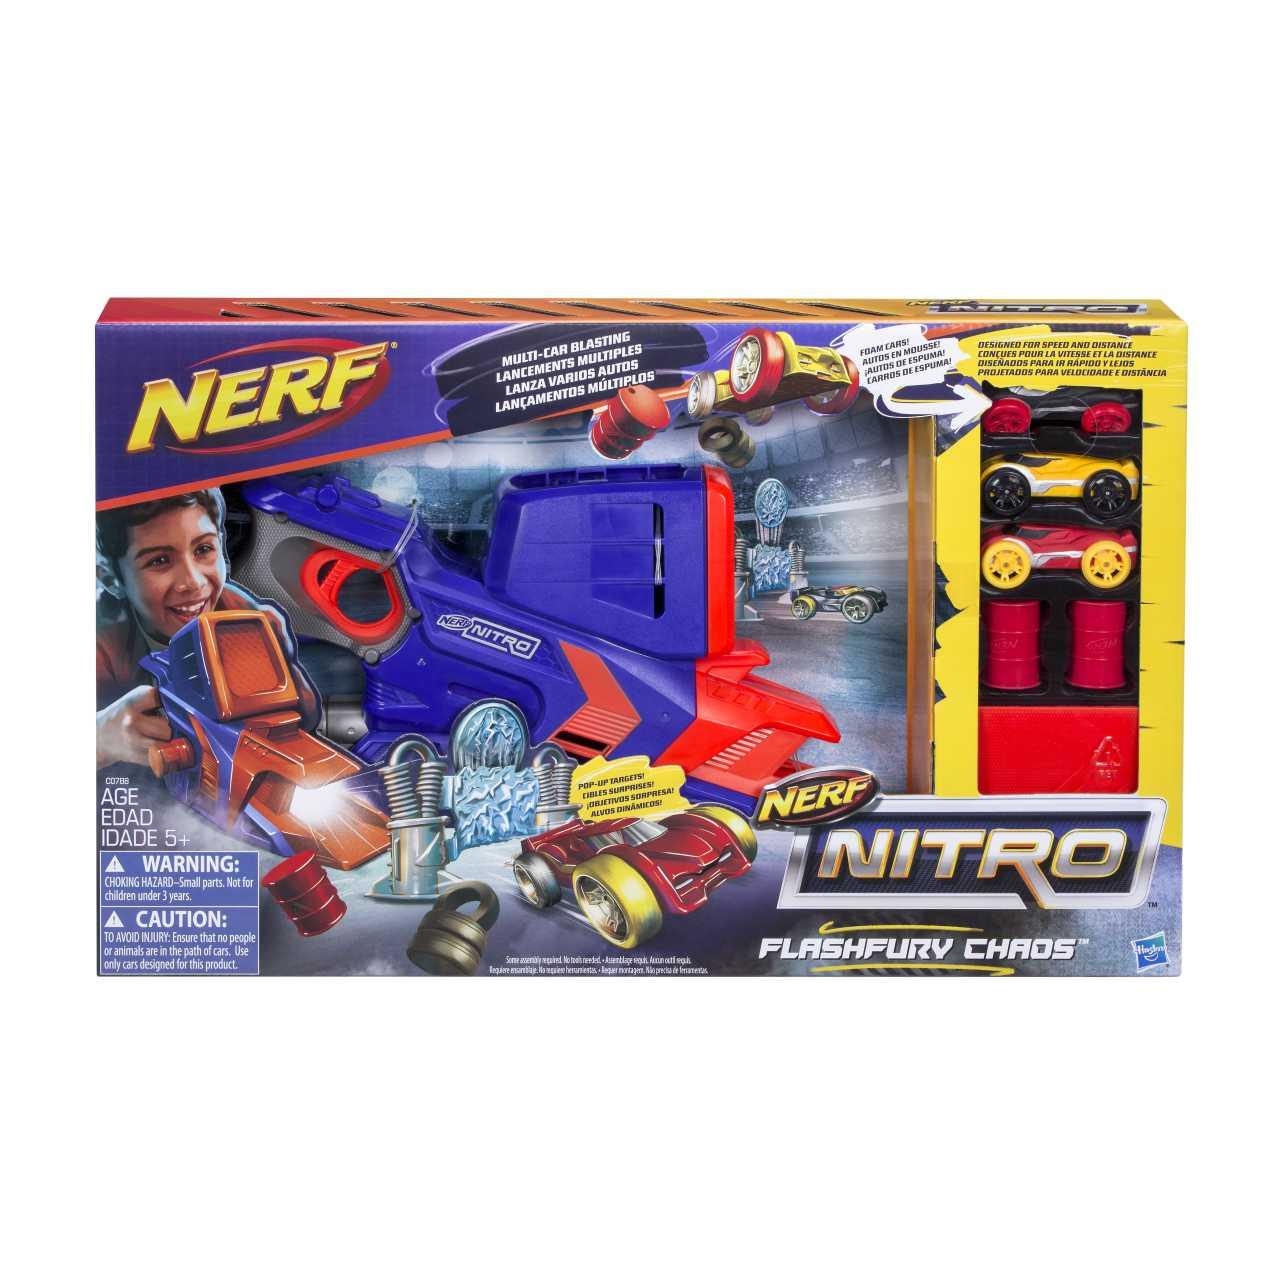 Nerf Nitro Flashfury Chaos